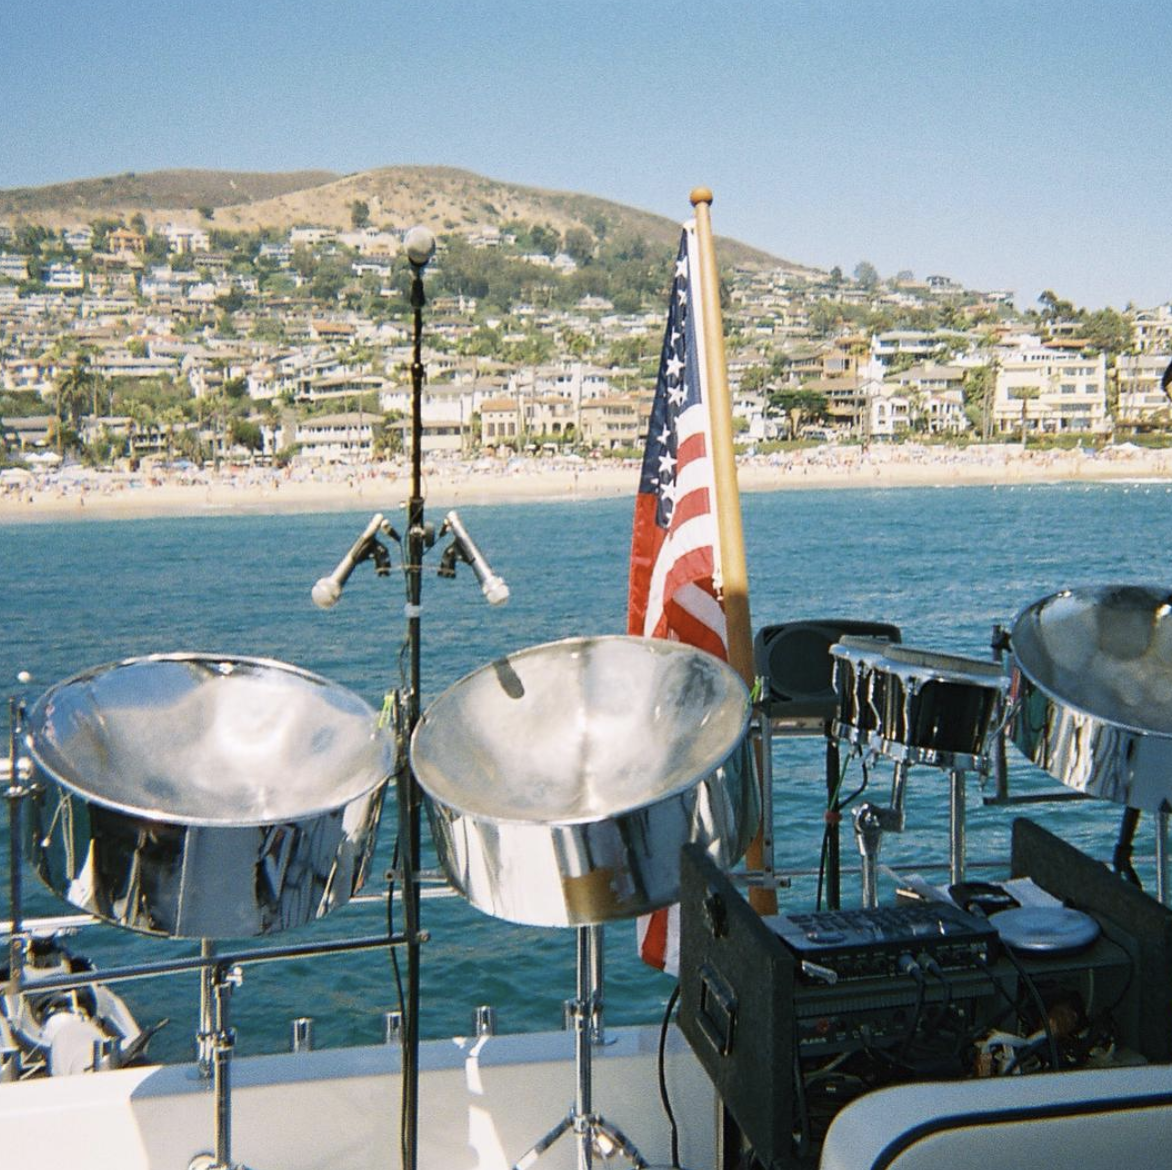 setuponboat